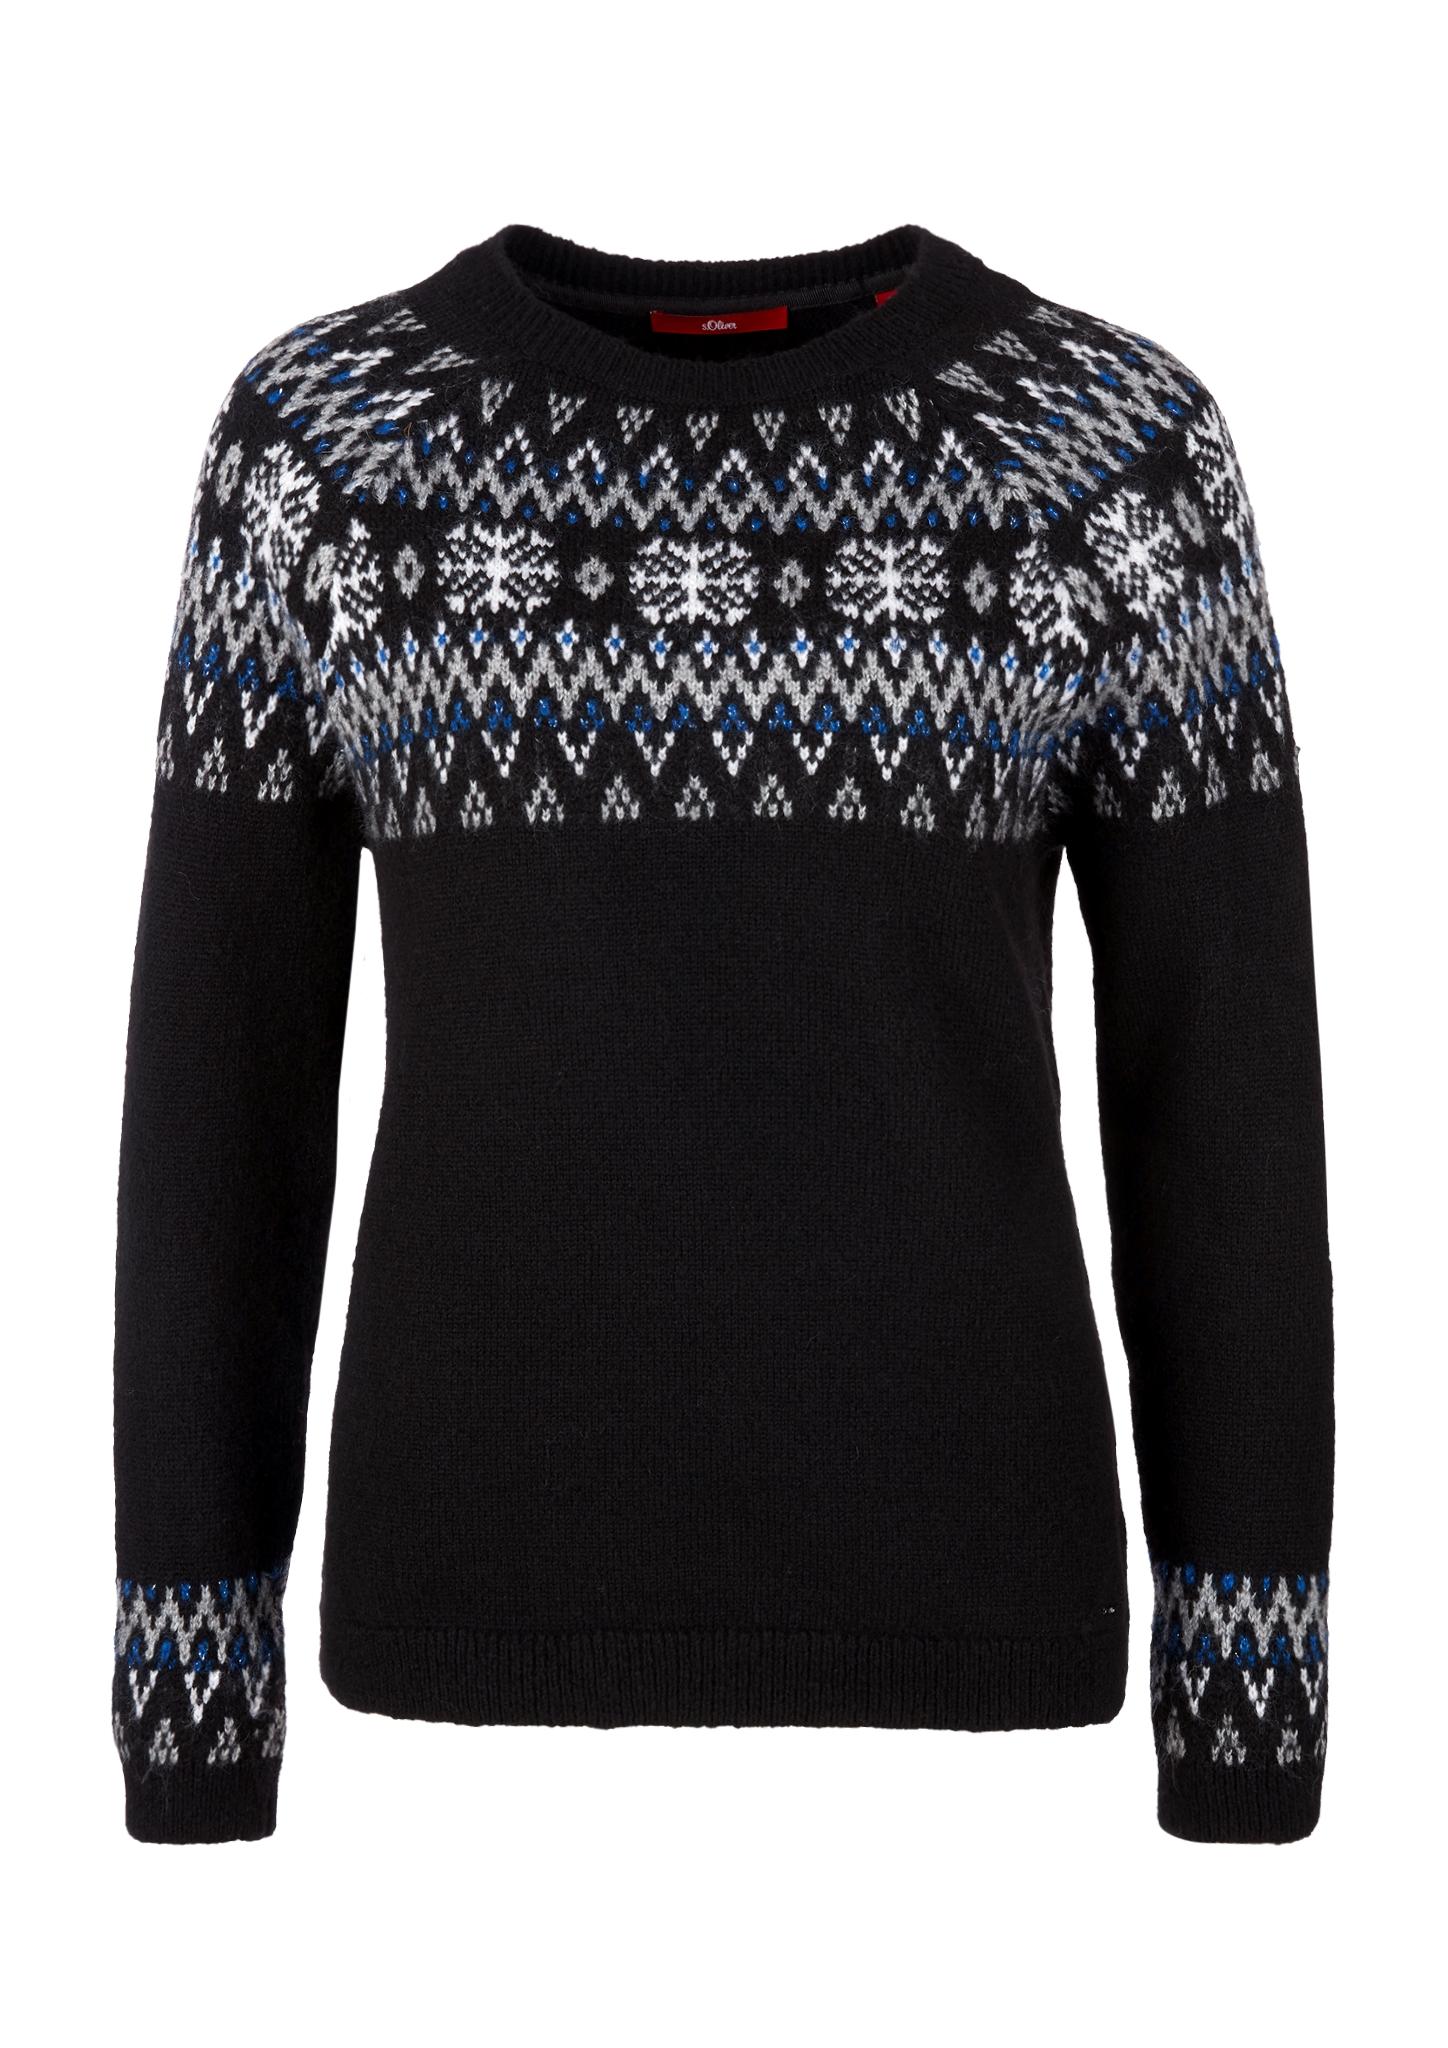 Norweger-Pullover | Bekleidung > Pullover > Norwegerpullover | Schwarz | 66% polyacryl -  27% polyester -  7% wolle | s.Oliver